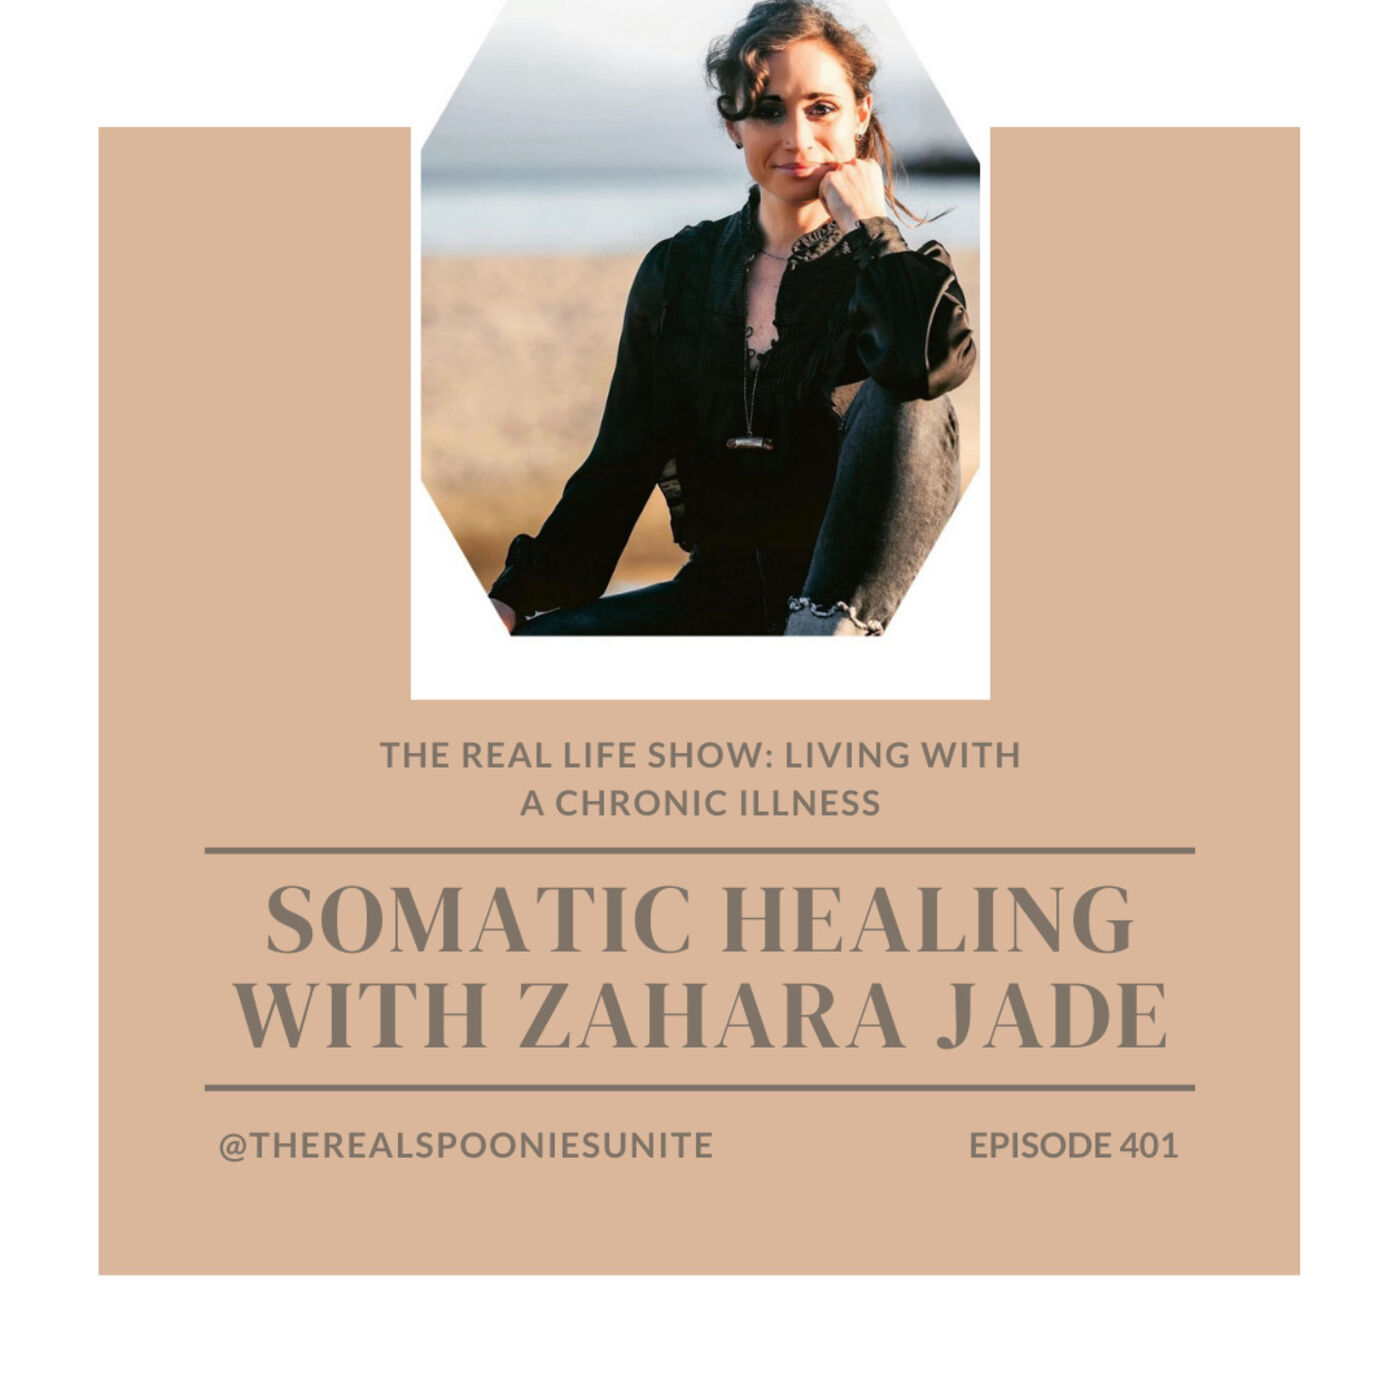 Somatic Healing with Zahara Jade